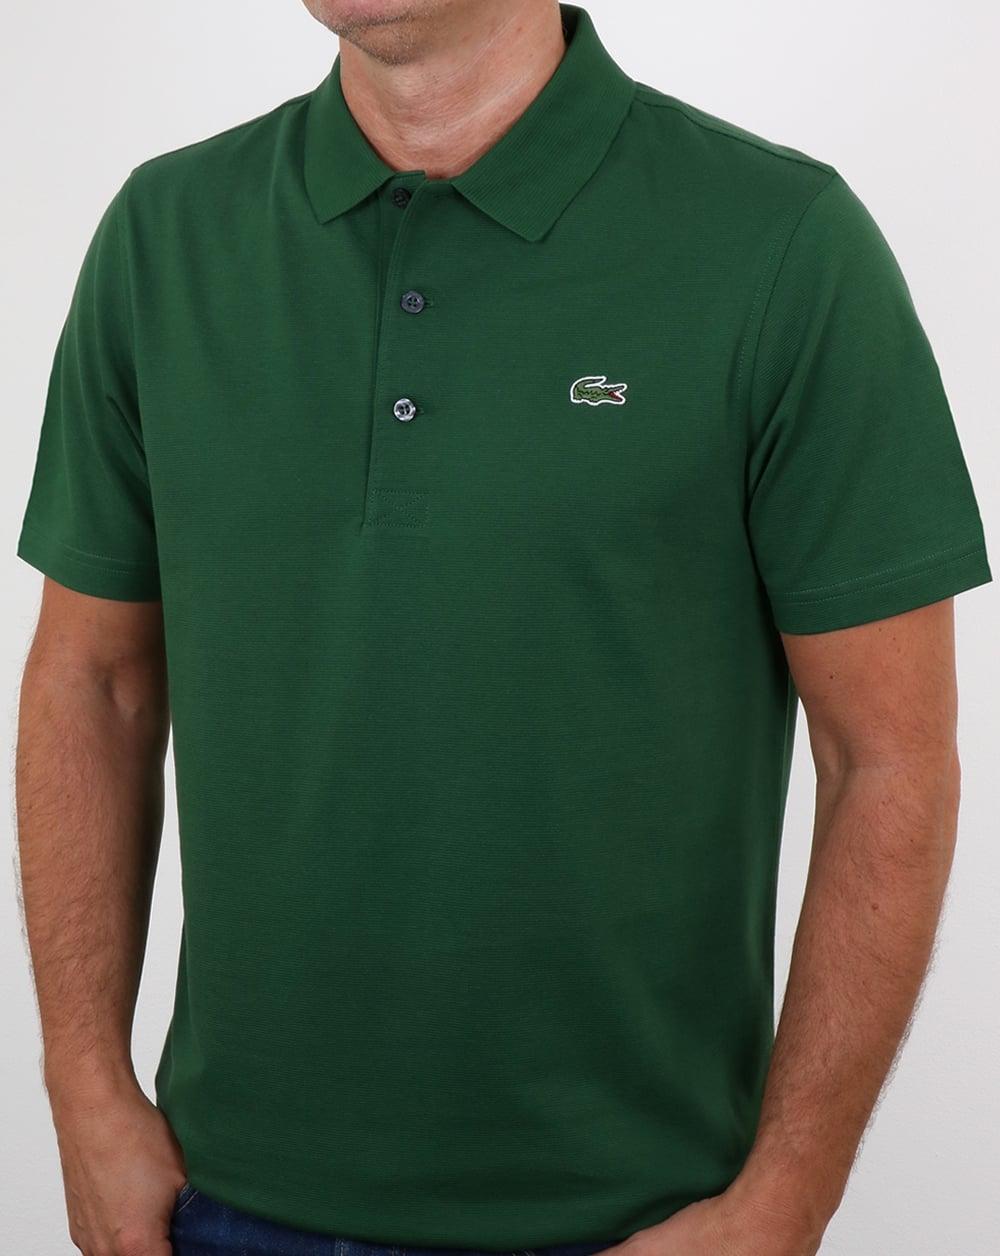 28290235a Lacoste Lacoste Polo Shirt Green